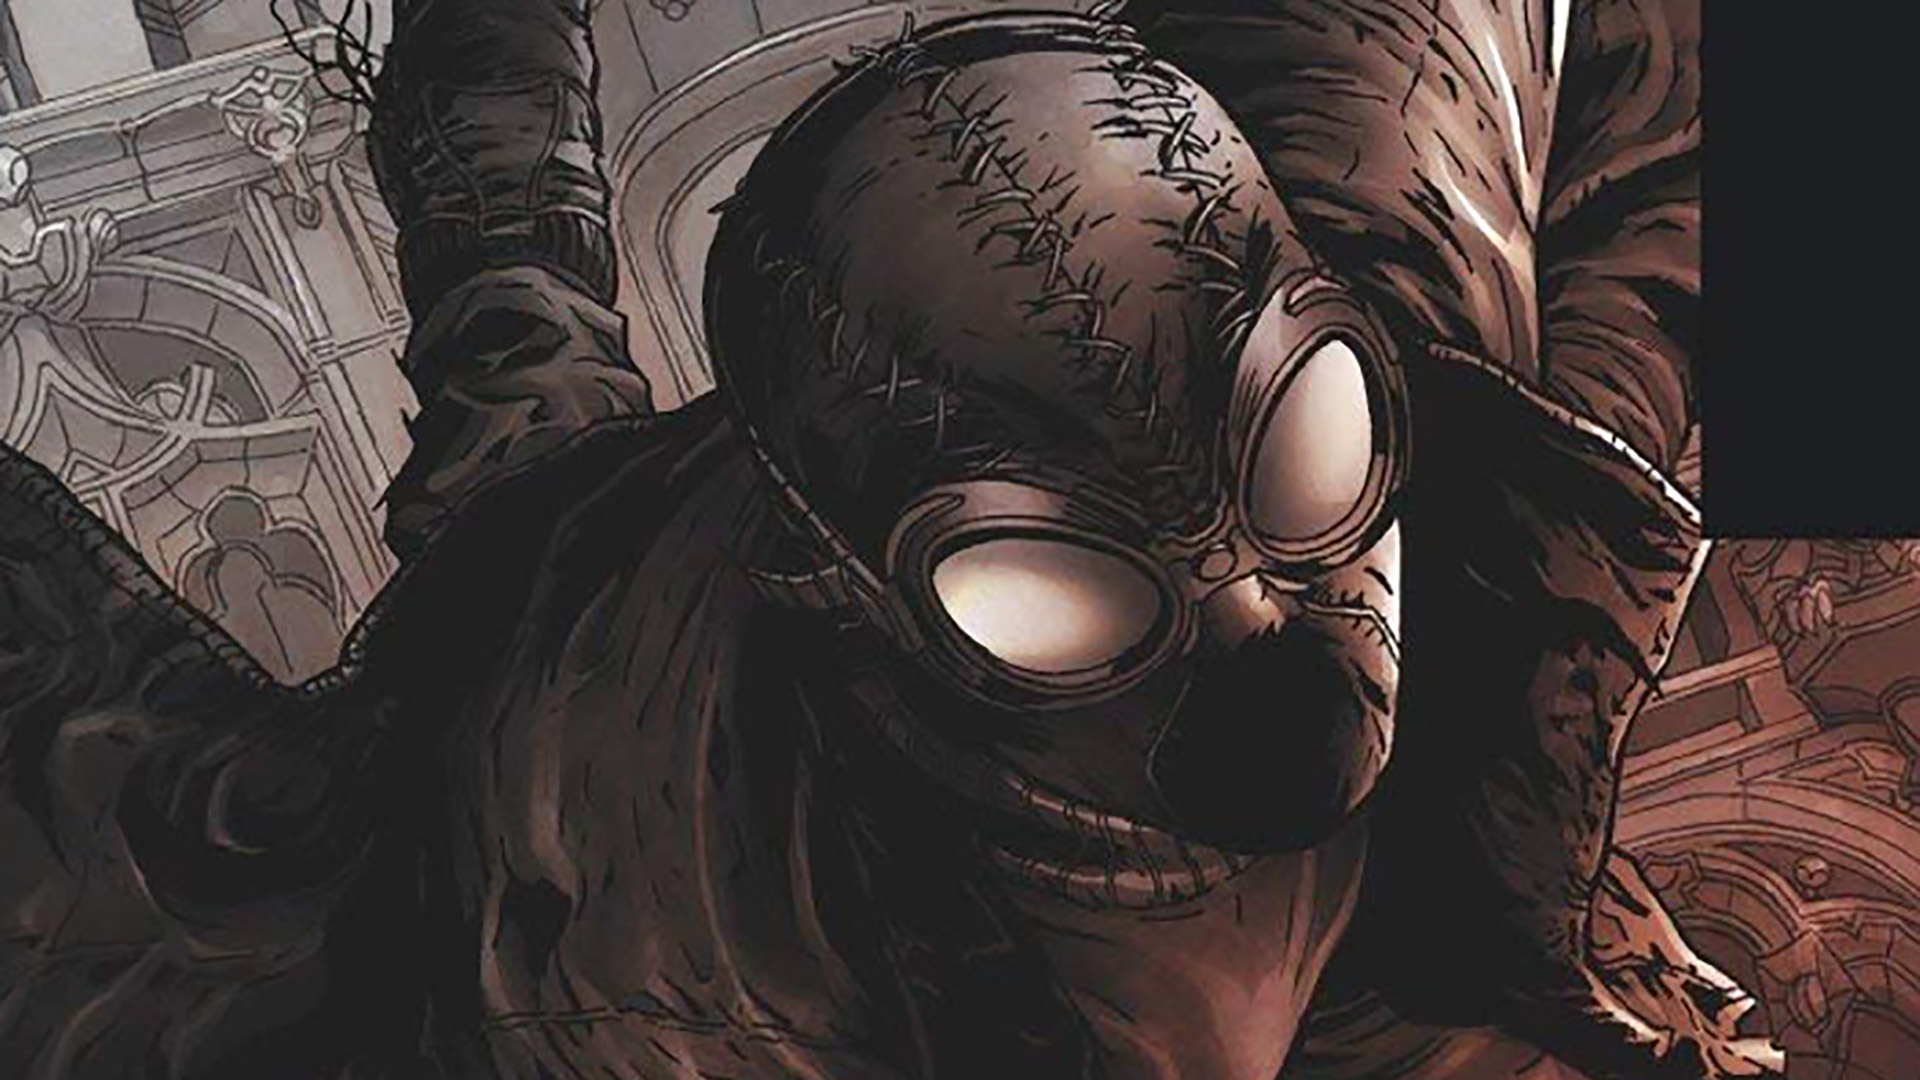 Best Spider-Man comics: the greatest Spider-Man stories, ranked